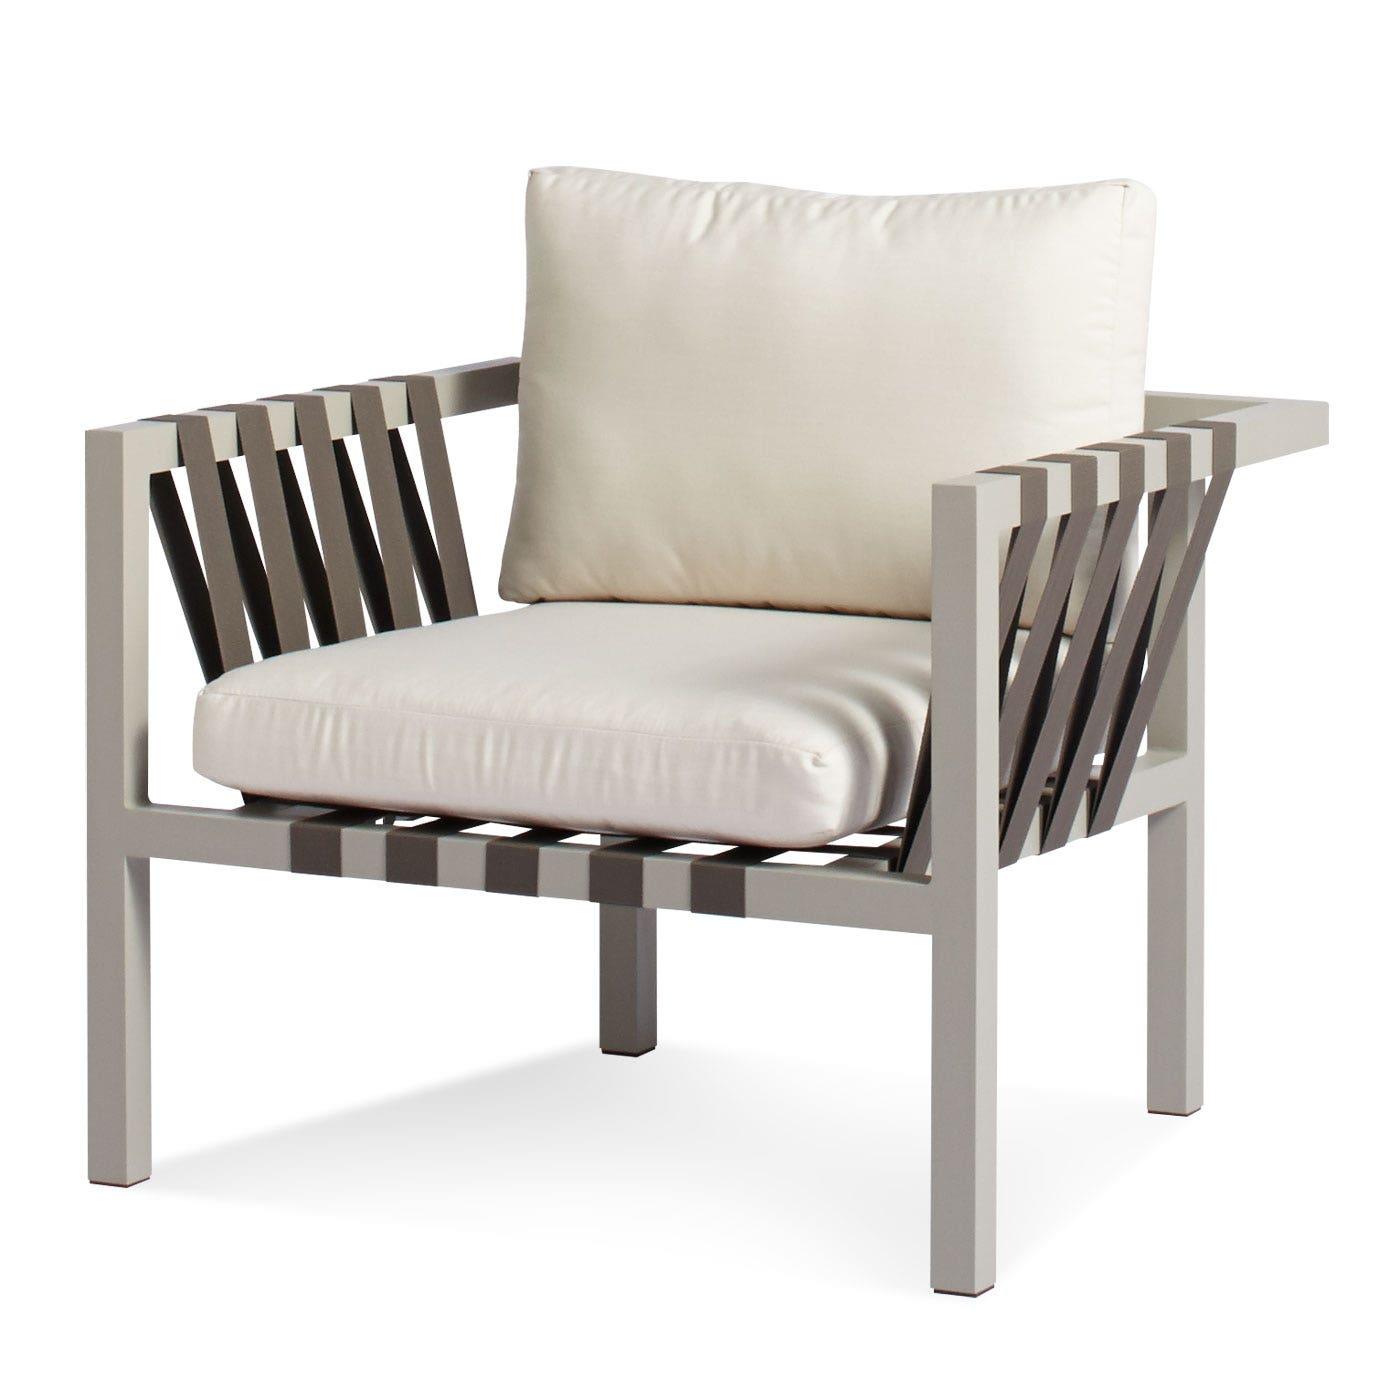 Jibe Outdoor Lounge Chairs Modern Outdoor Furniture Blu Dot